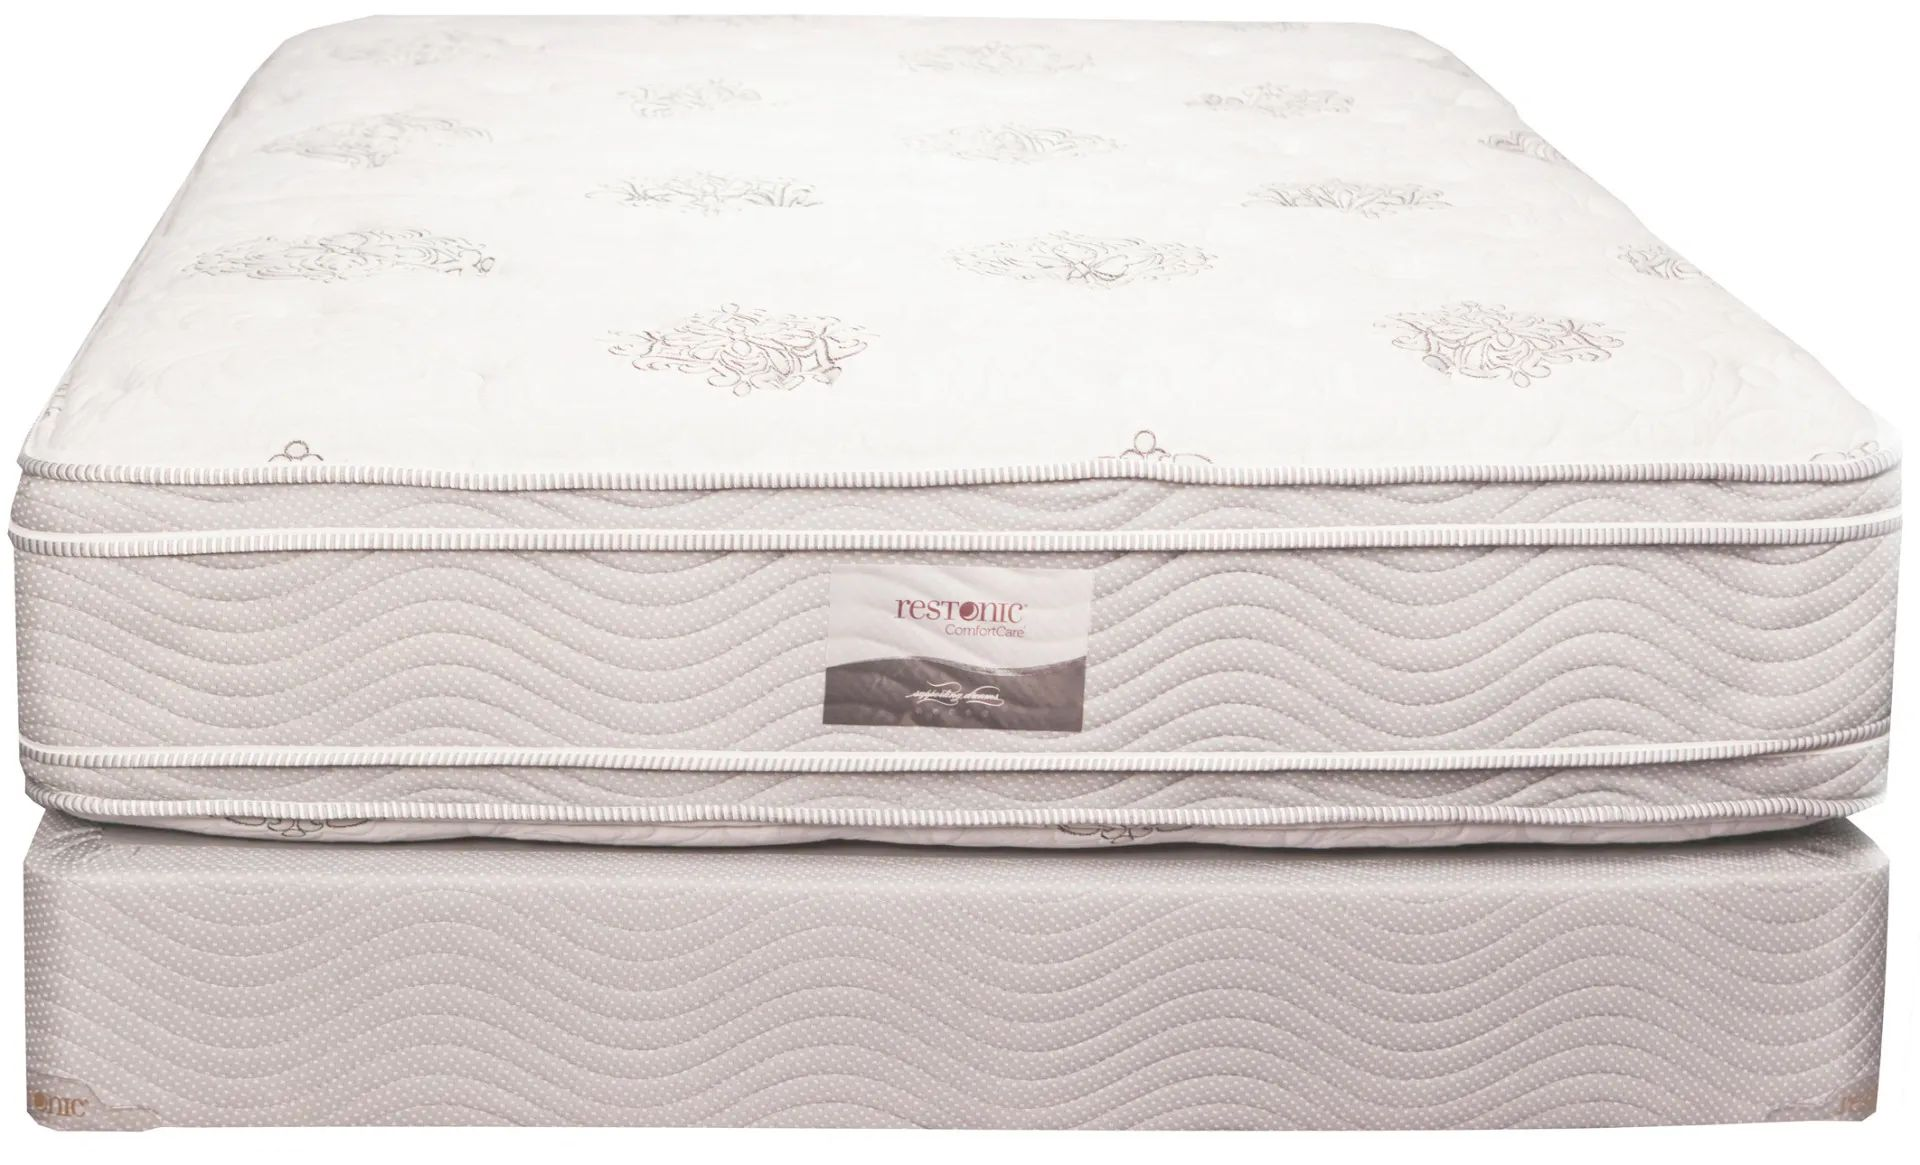 california king pillow top mattress